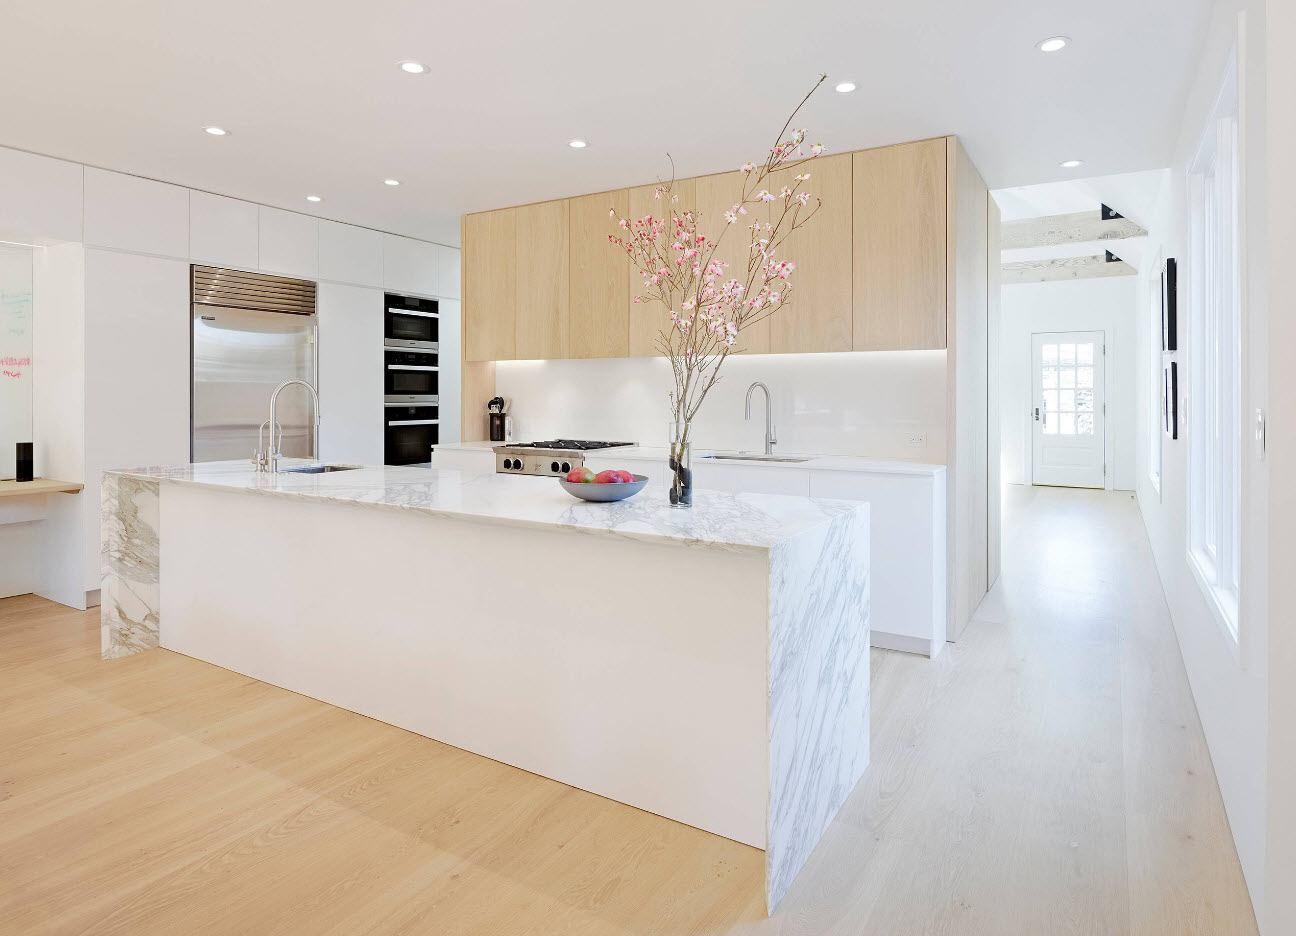 160 Square Feet Kitchen Design Ideas. Light wooden laminate on the floor and white kitchen island